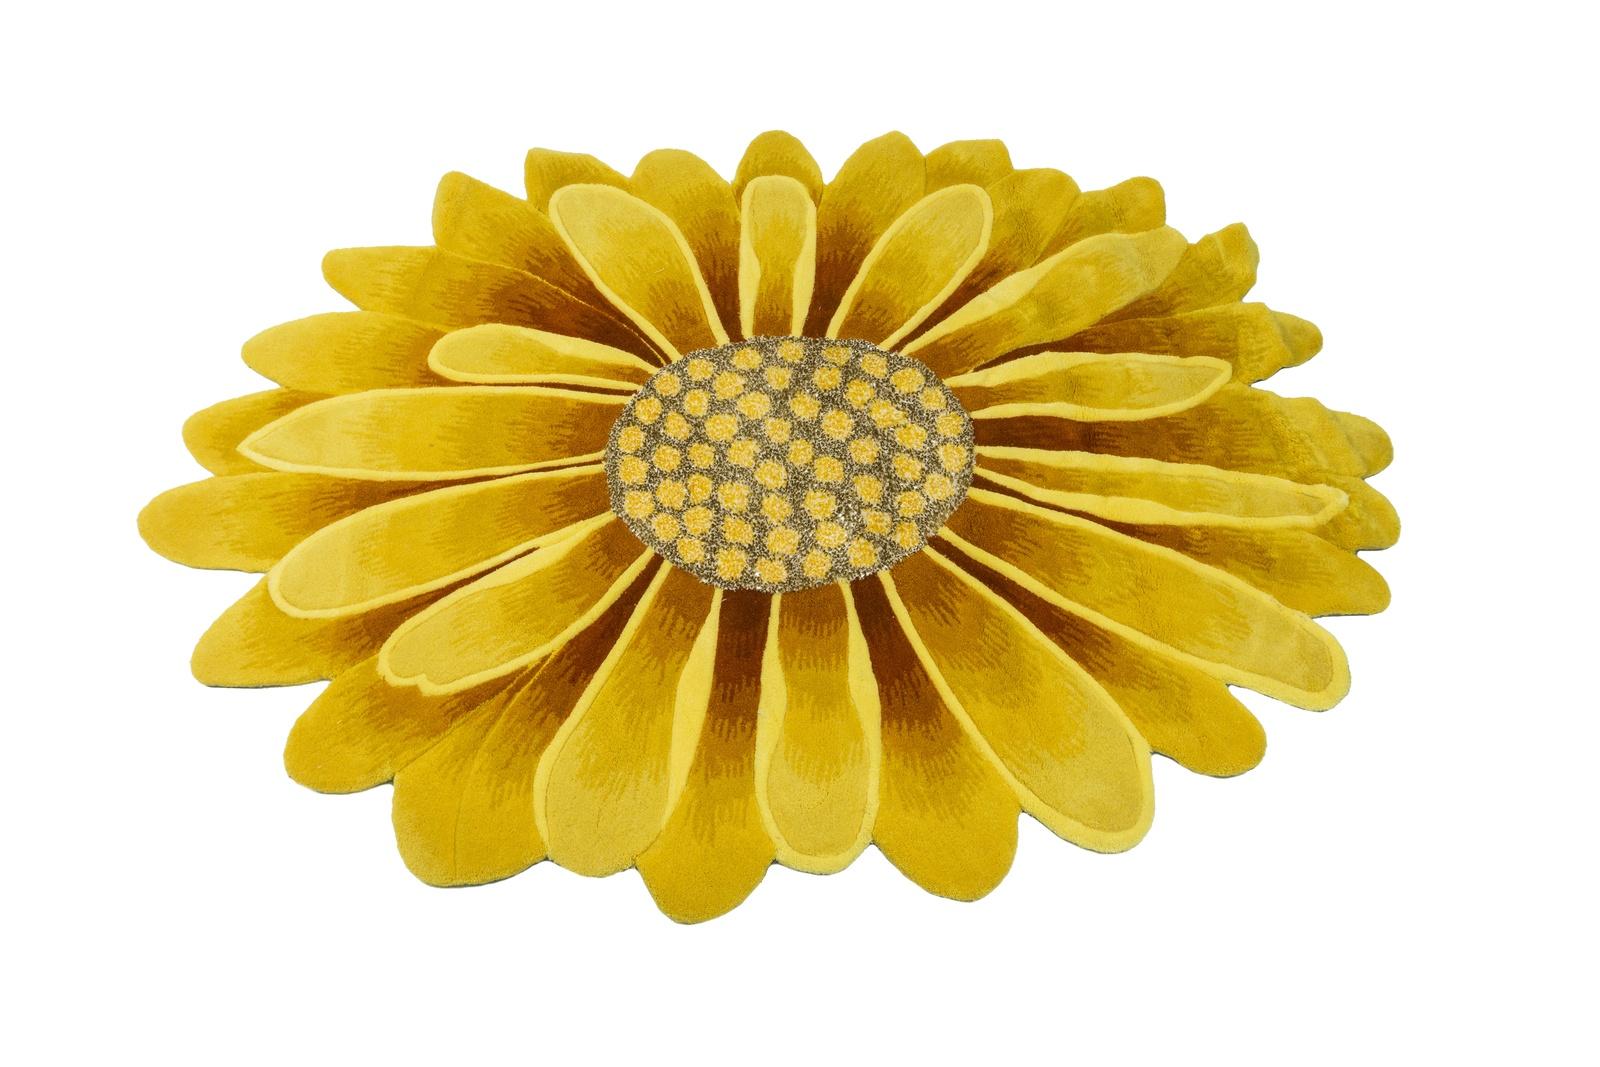 Ковер MADONNA 1,2х1,8/фигурный, желтый